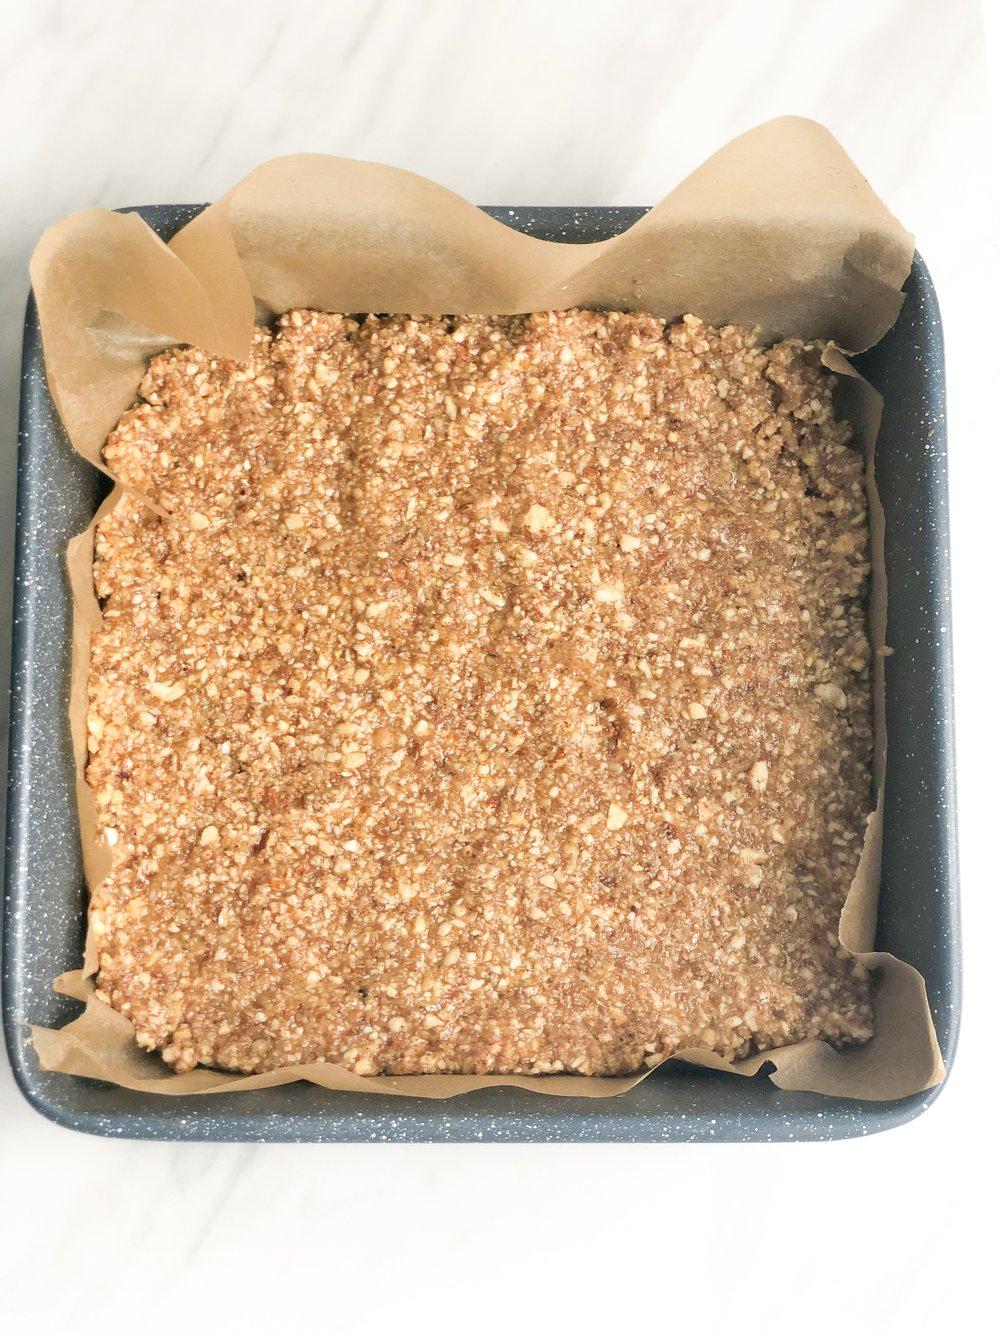 nut crust.JPG